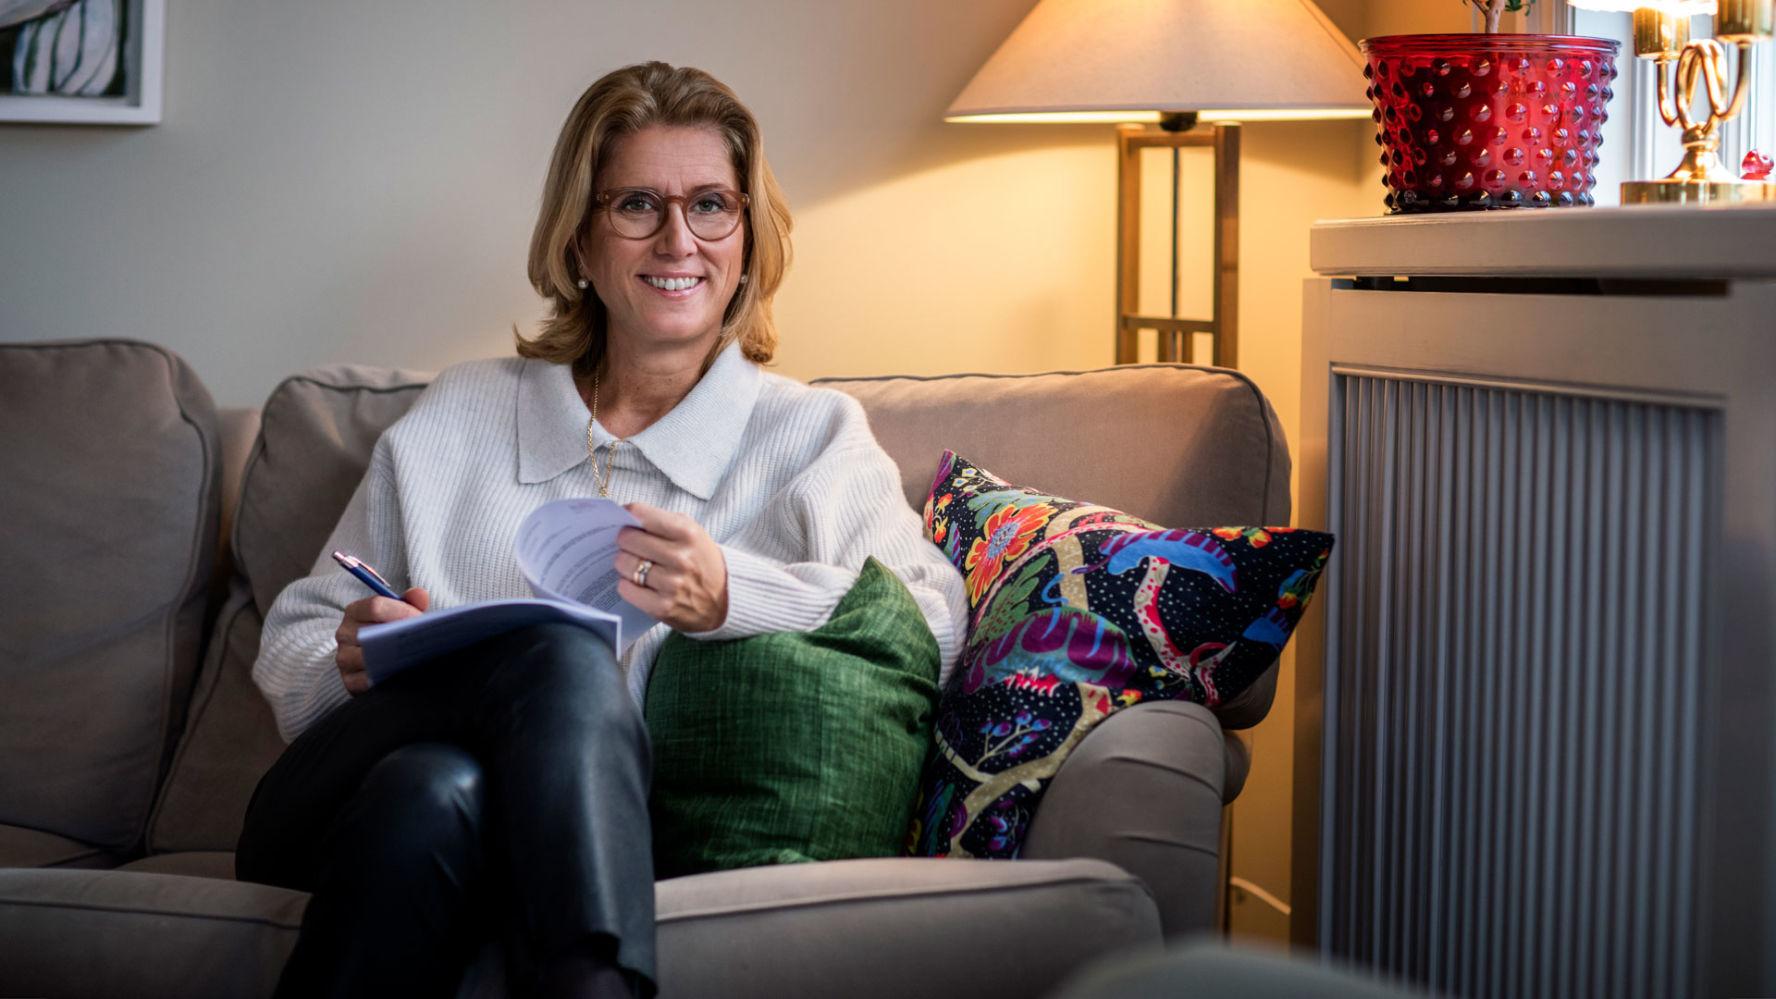 Anna Martling sitter i soffan